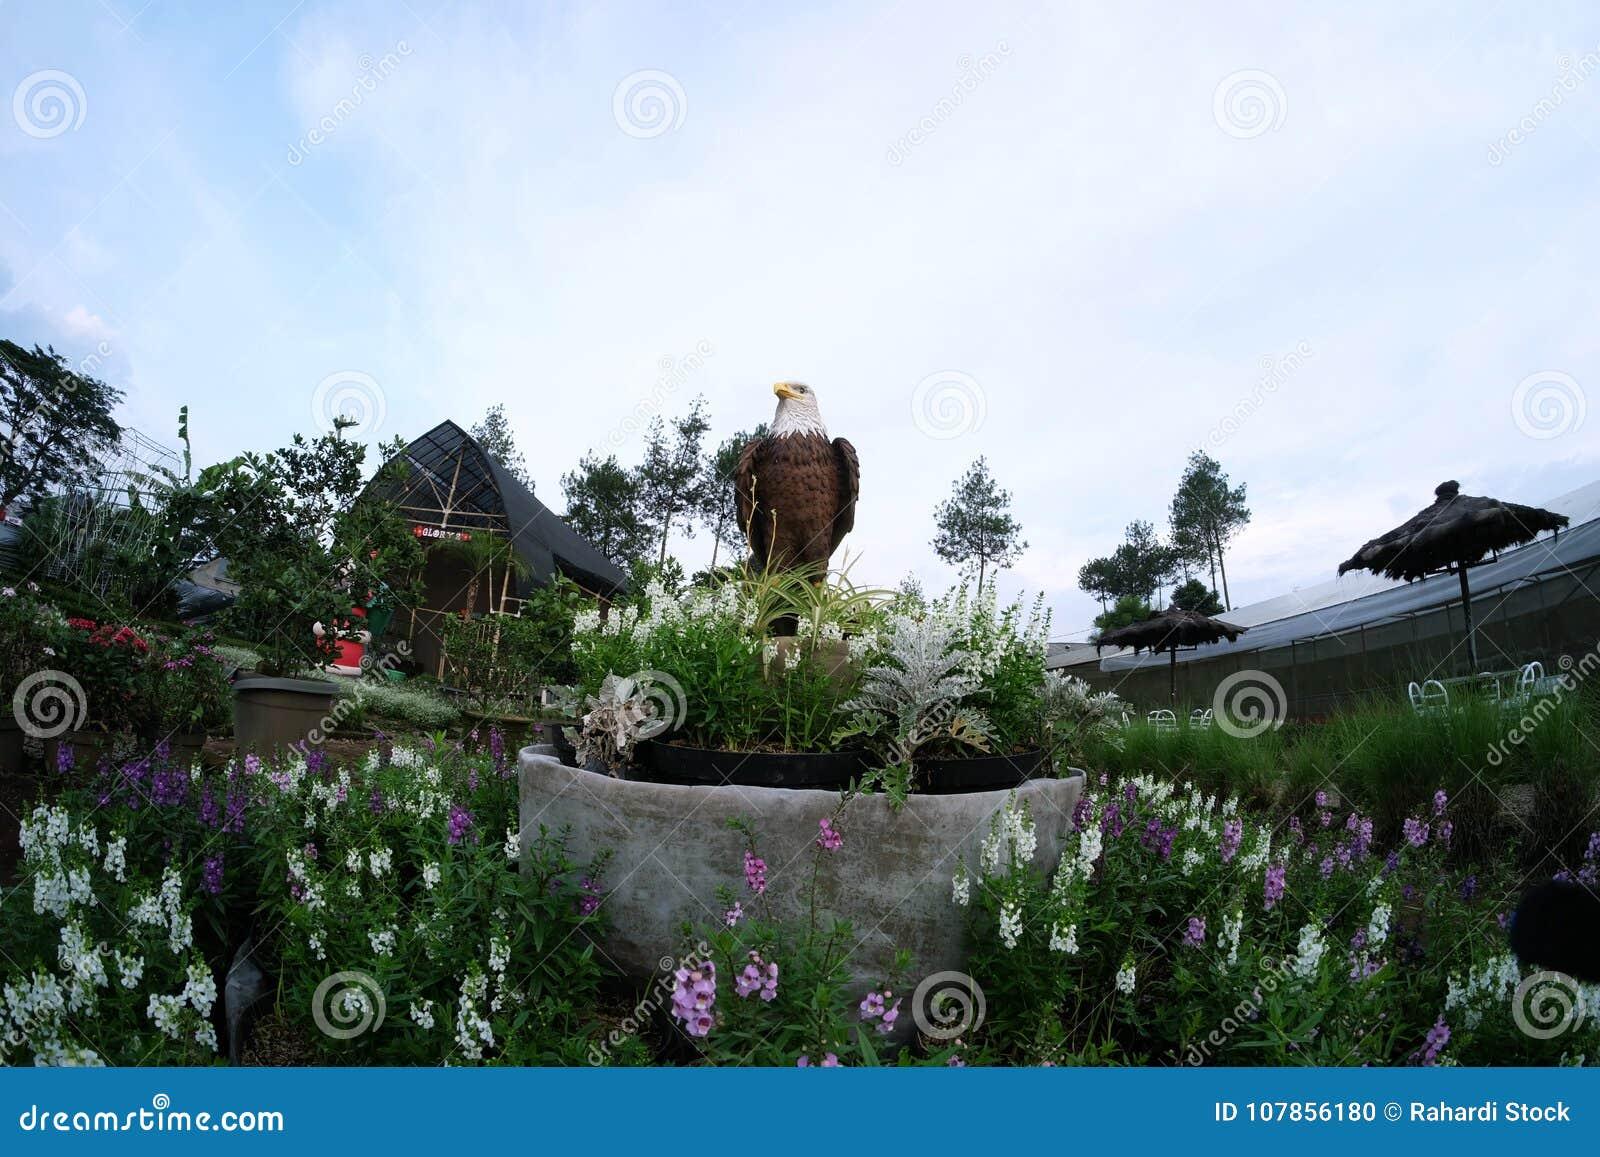 Statue white eagle head with brown fur surrounded by assorted statue white eagle head with brown fur surrounded by assorted flowers in the beautiful garden mightylinksfo